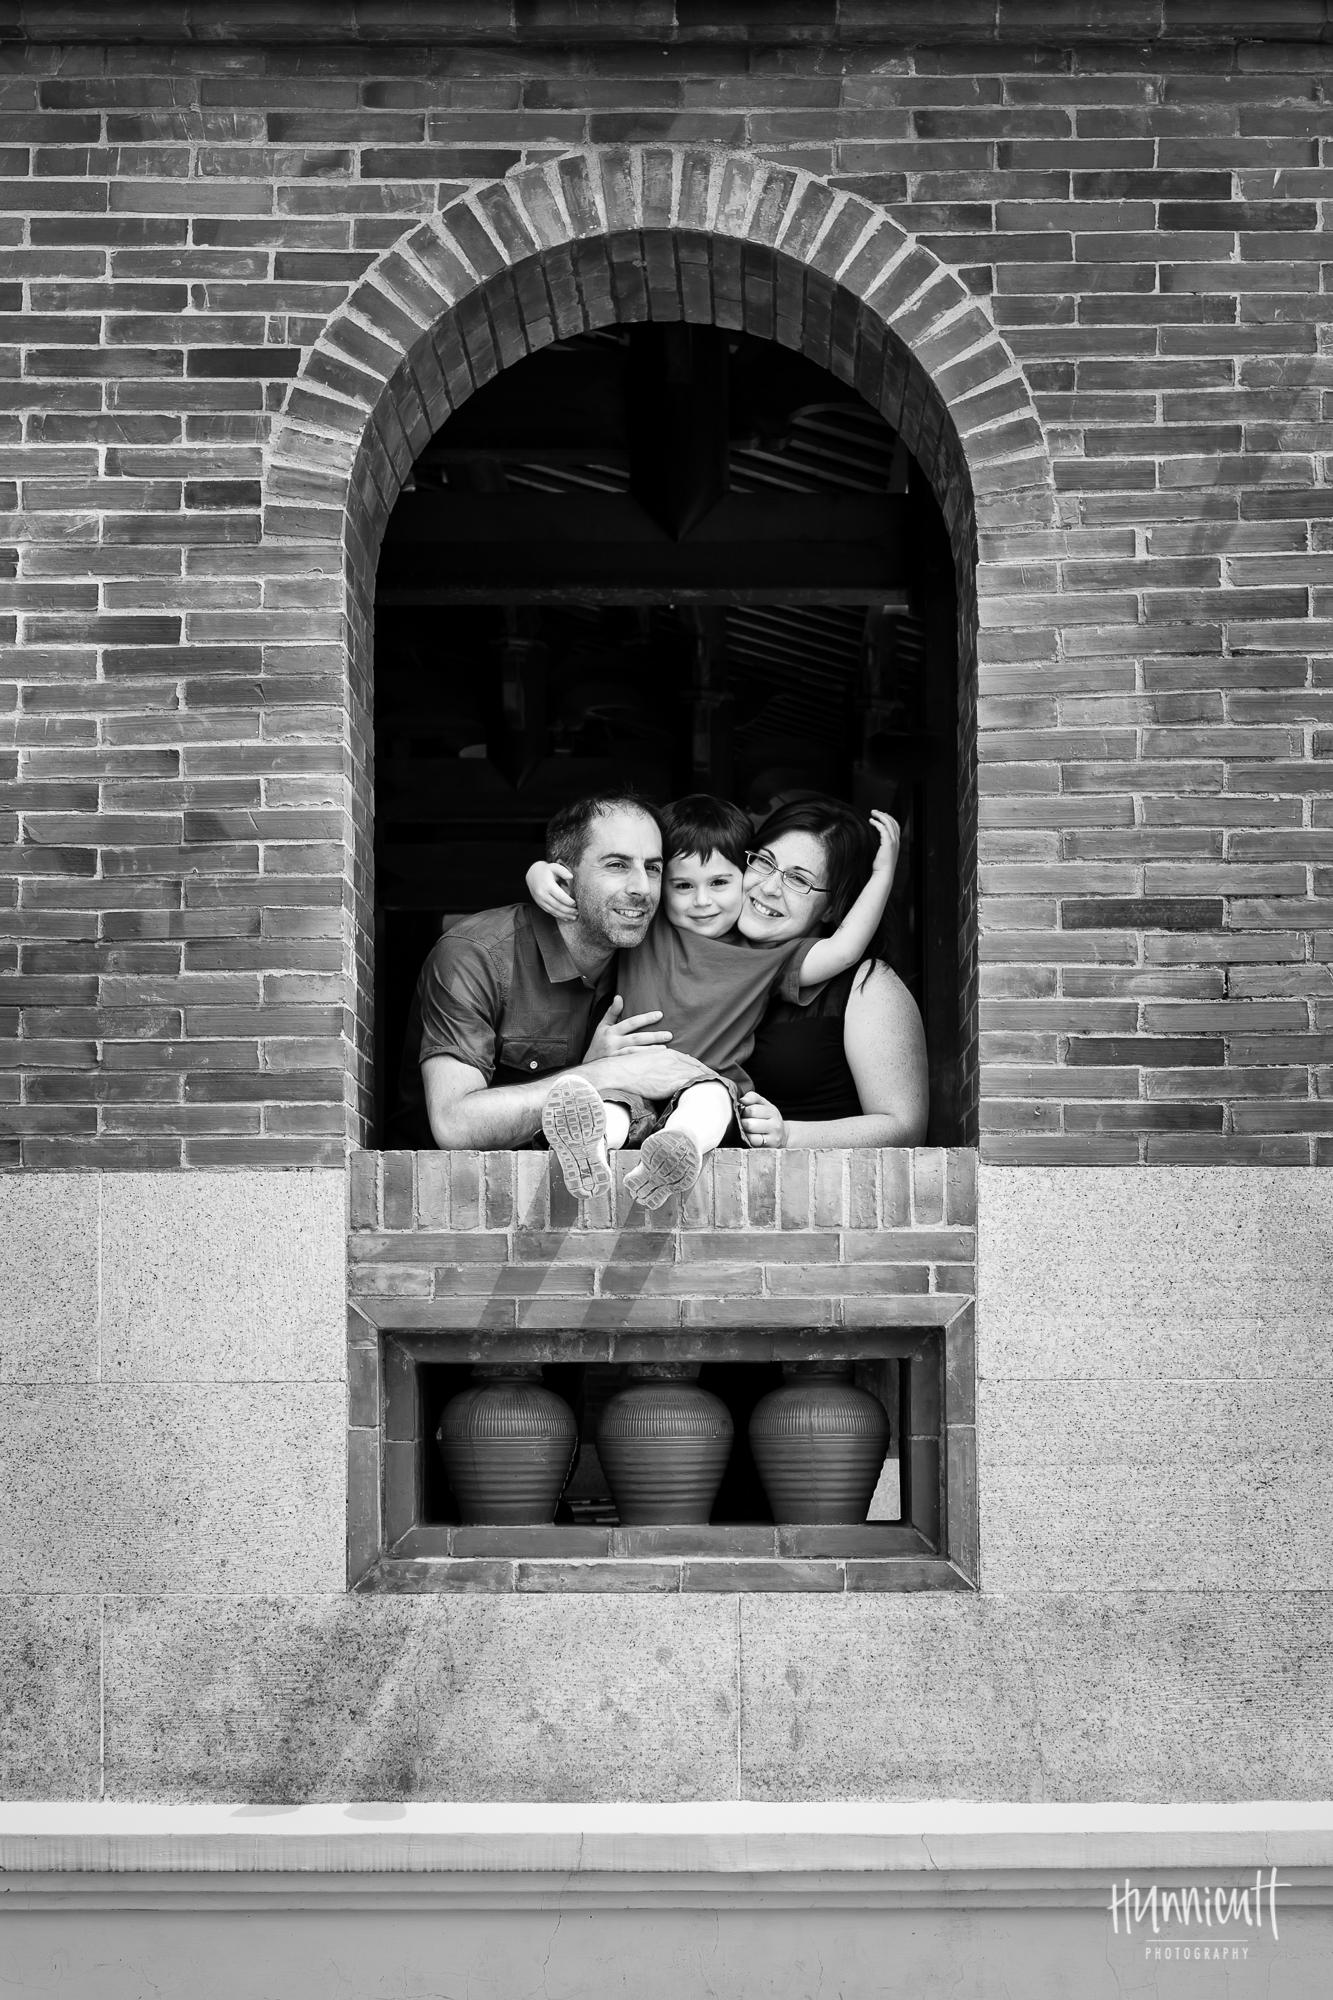 Family-Outdoor-Lifestyle-Modern-Urban-Travel-Culture-HunnicuttPhotography-RebeccaHunnicuttFarren-Taichung-Taiwan-5